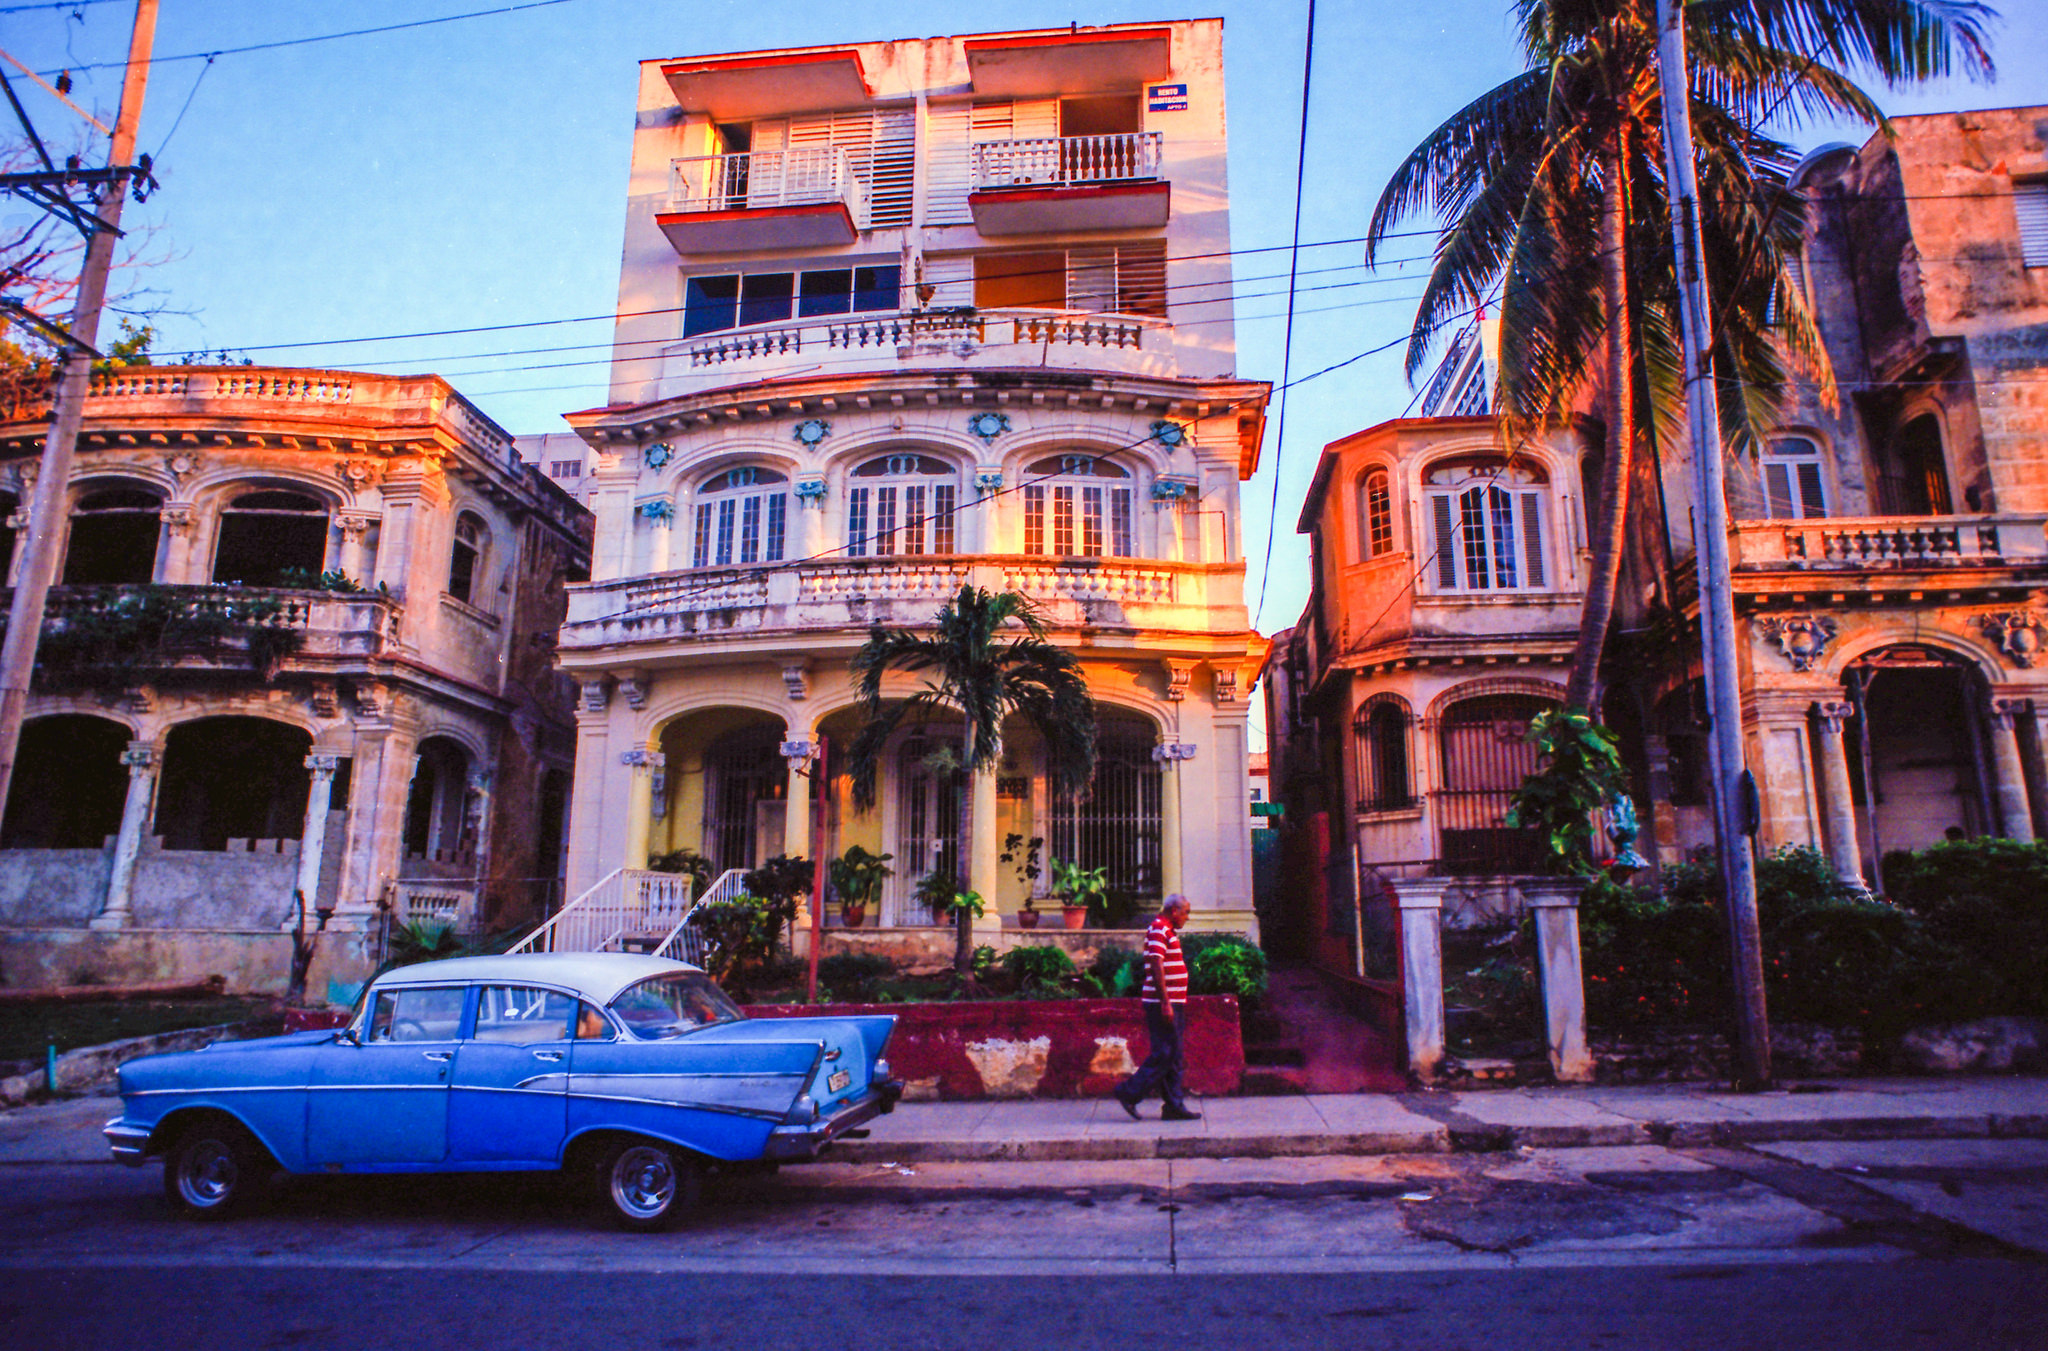 Vedado, Havana. taken on Nikon FE2, Nikkor 20mm f3.5, Ektar 100 35mm film